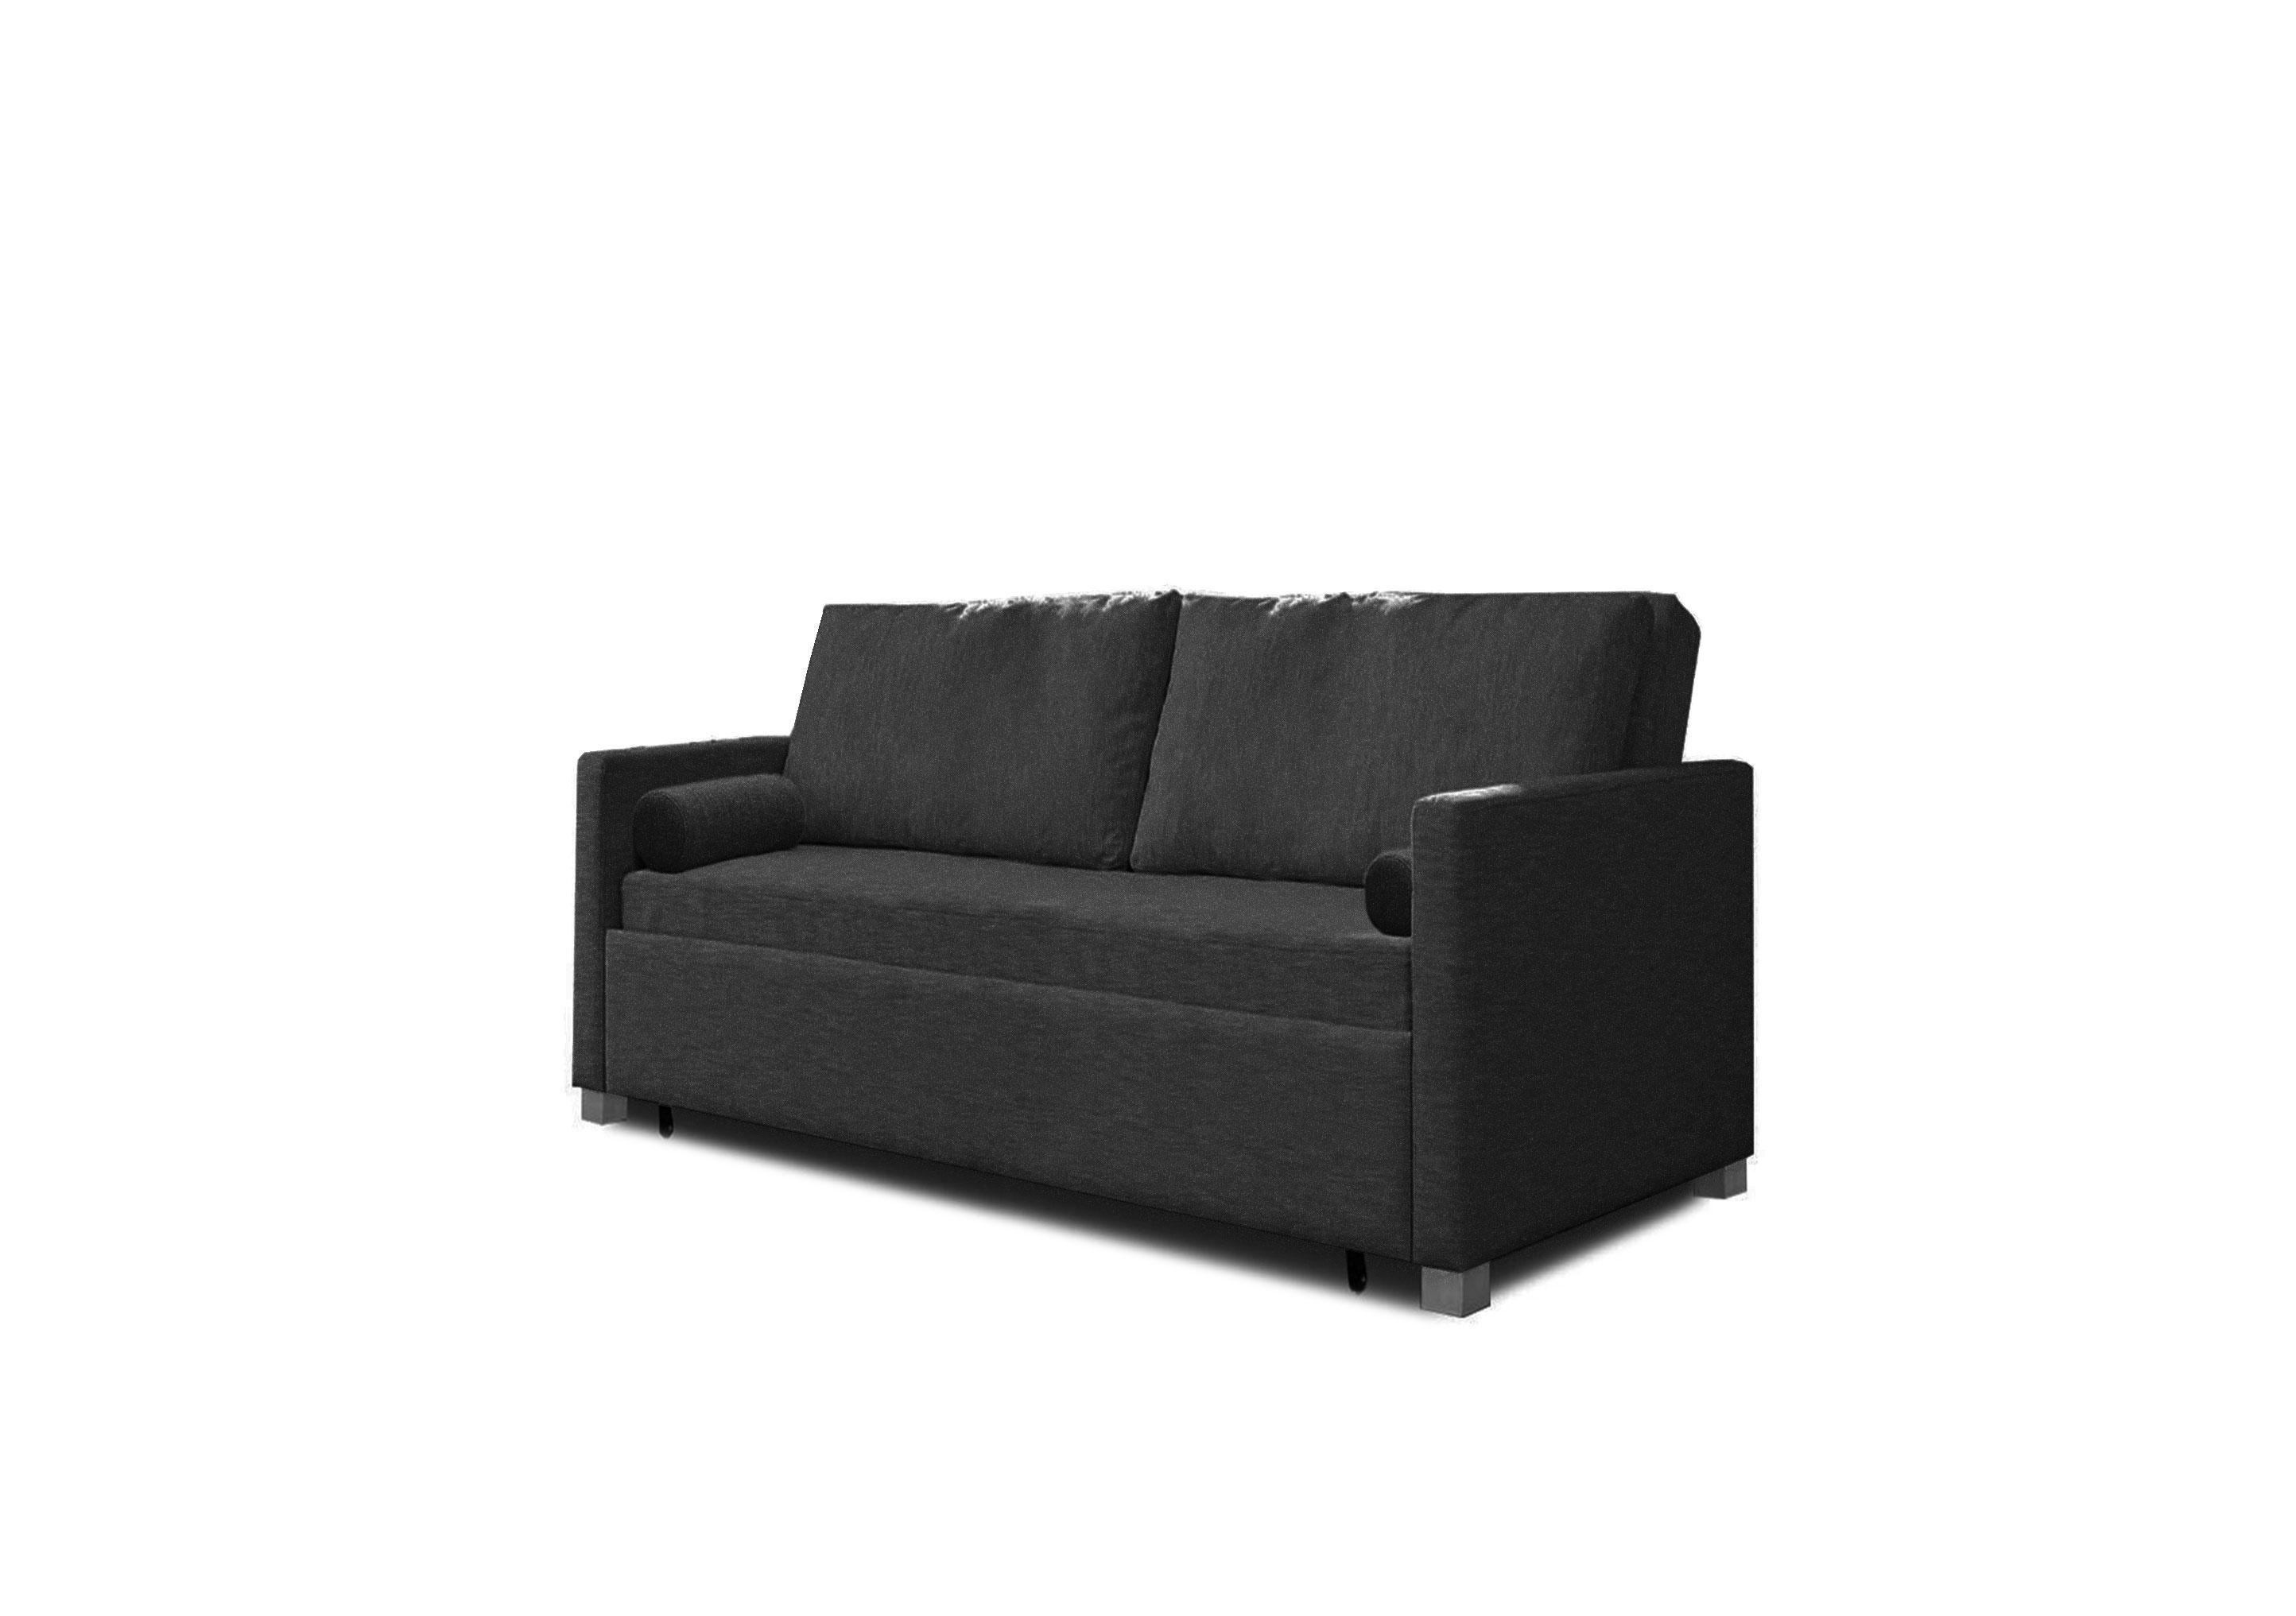 queen sleeper sofa memory foam mattress houston futon bed harmony  size